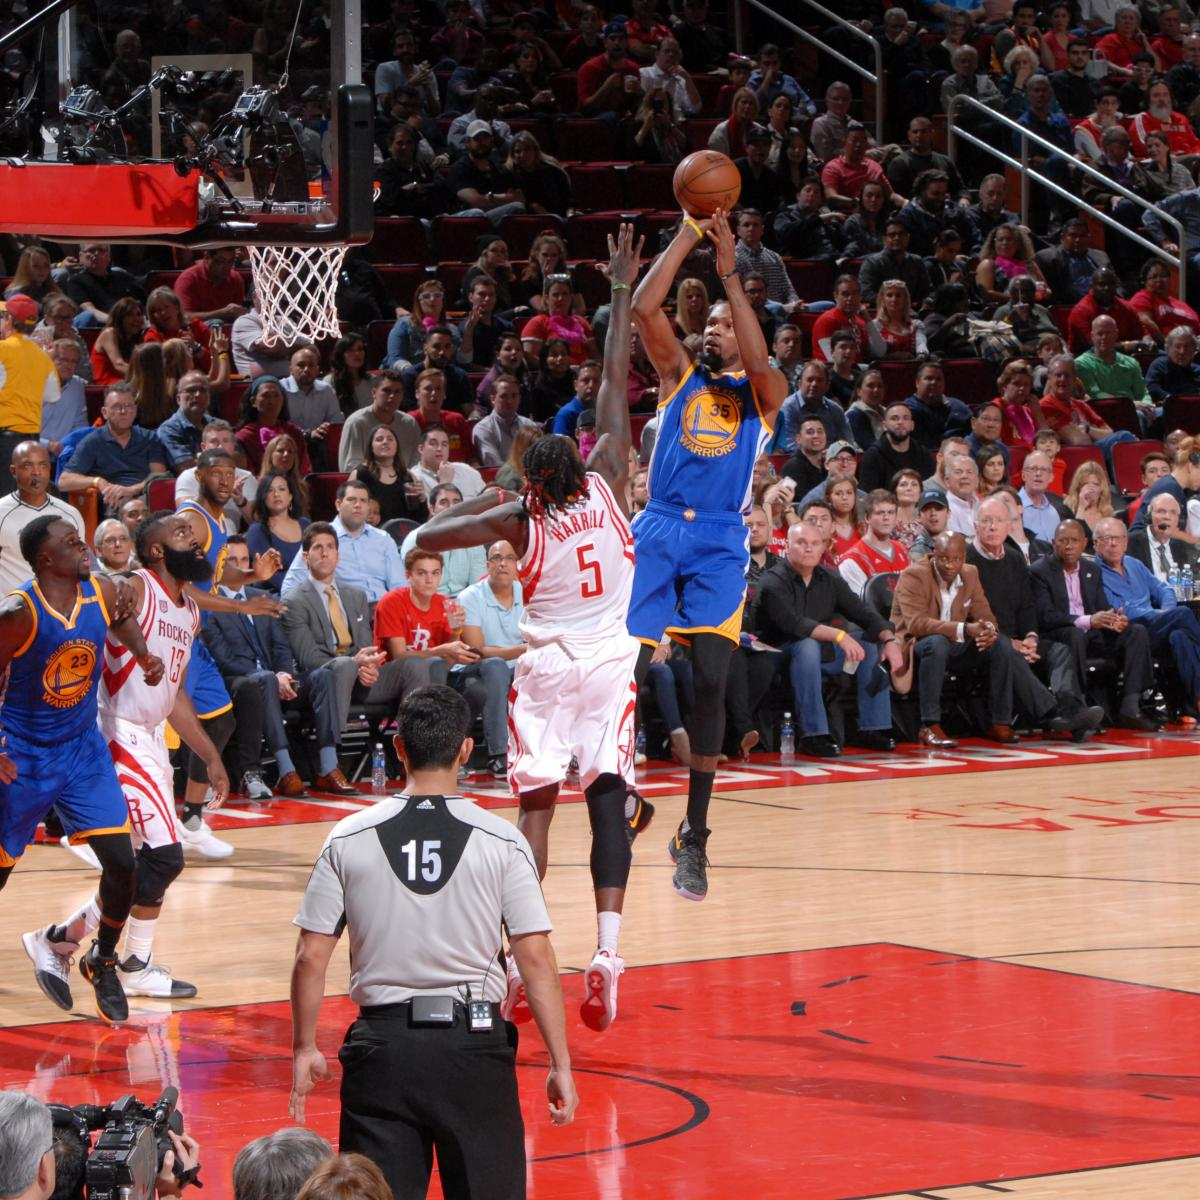 Rockets Vs Warriors May 24: Warriors Vs. Rockets: Score, Highlights, Reaction From